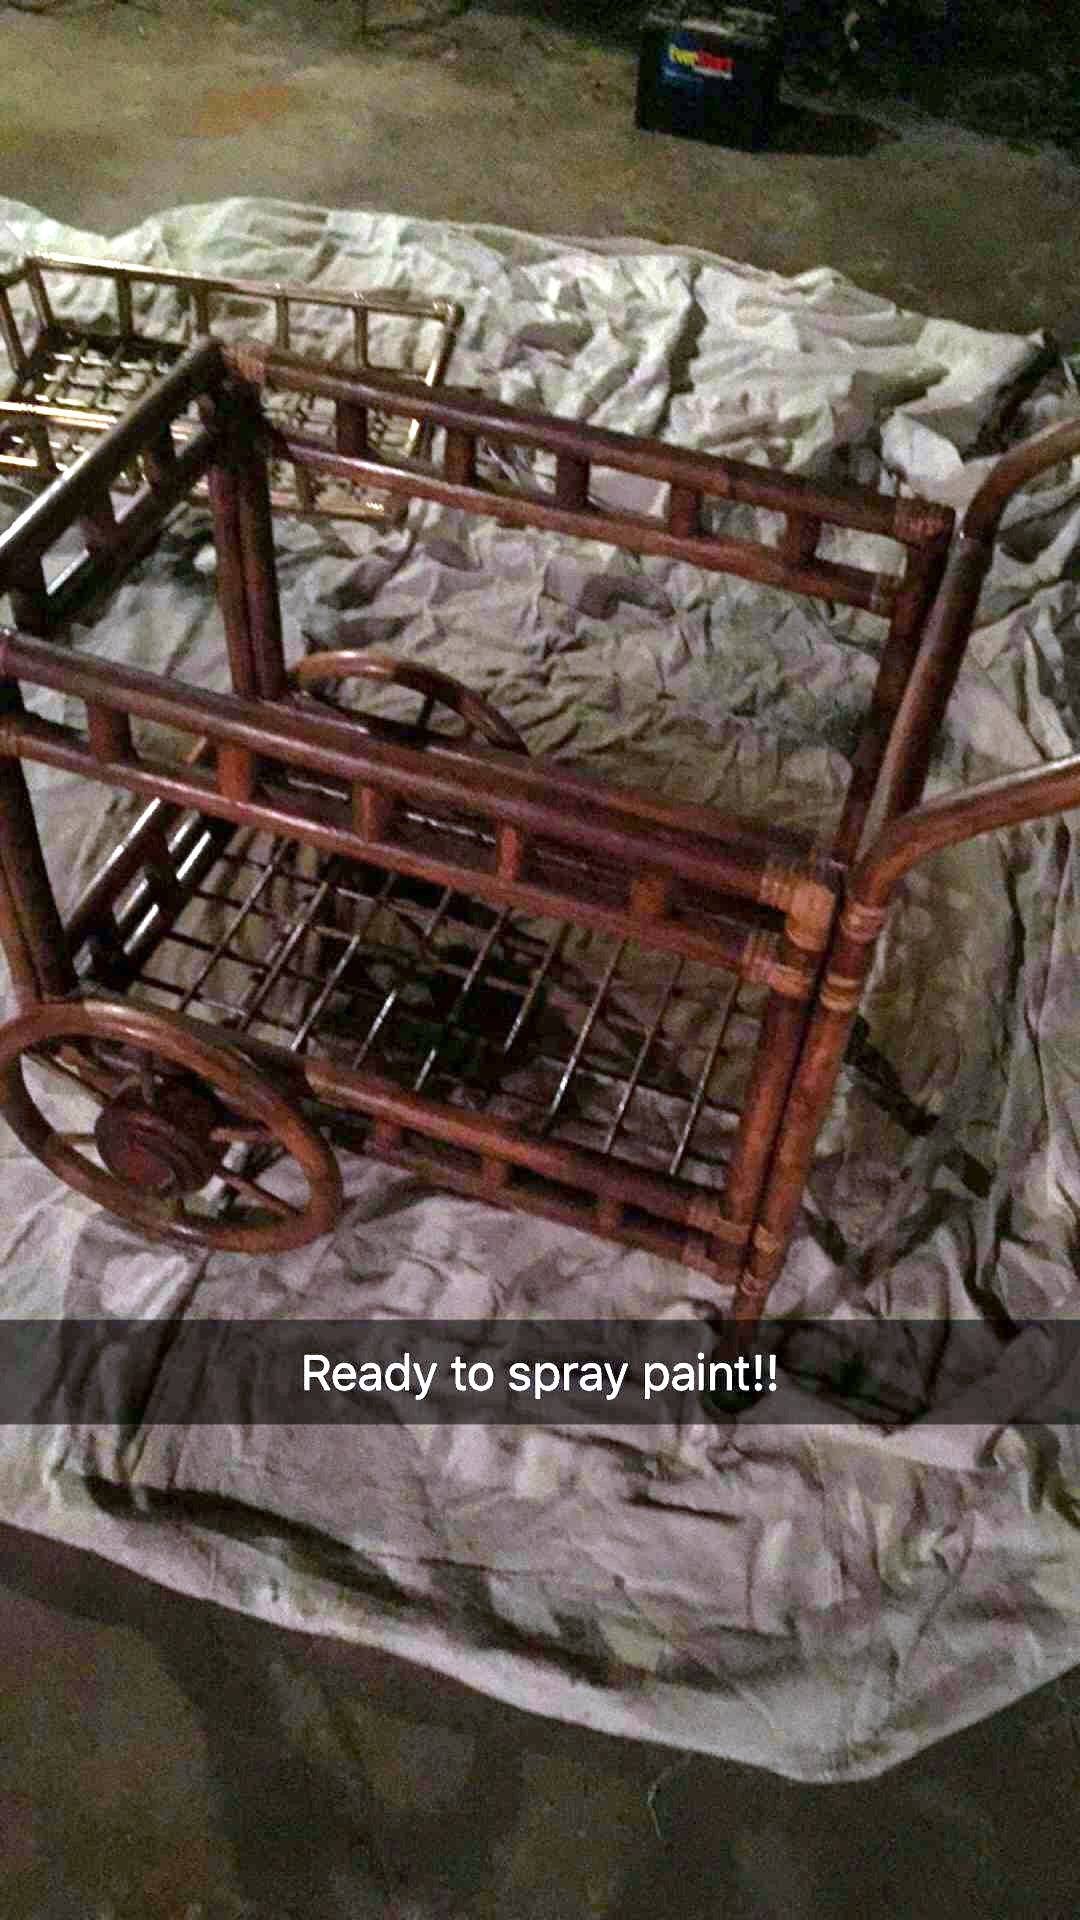 rattan coffee cart ready to spray paint